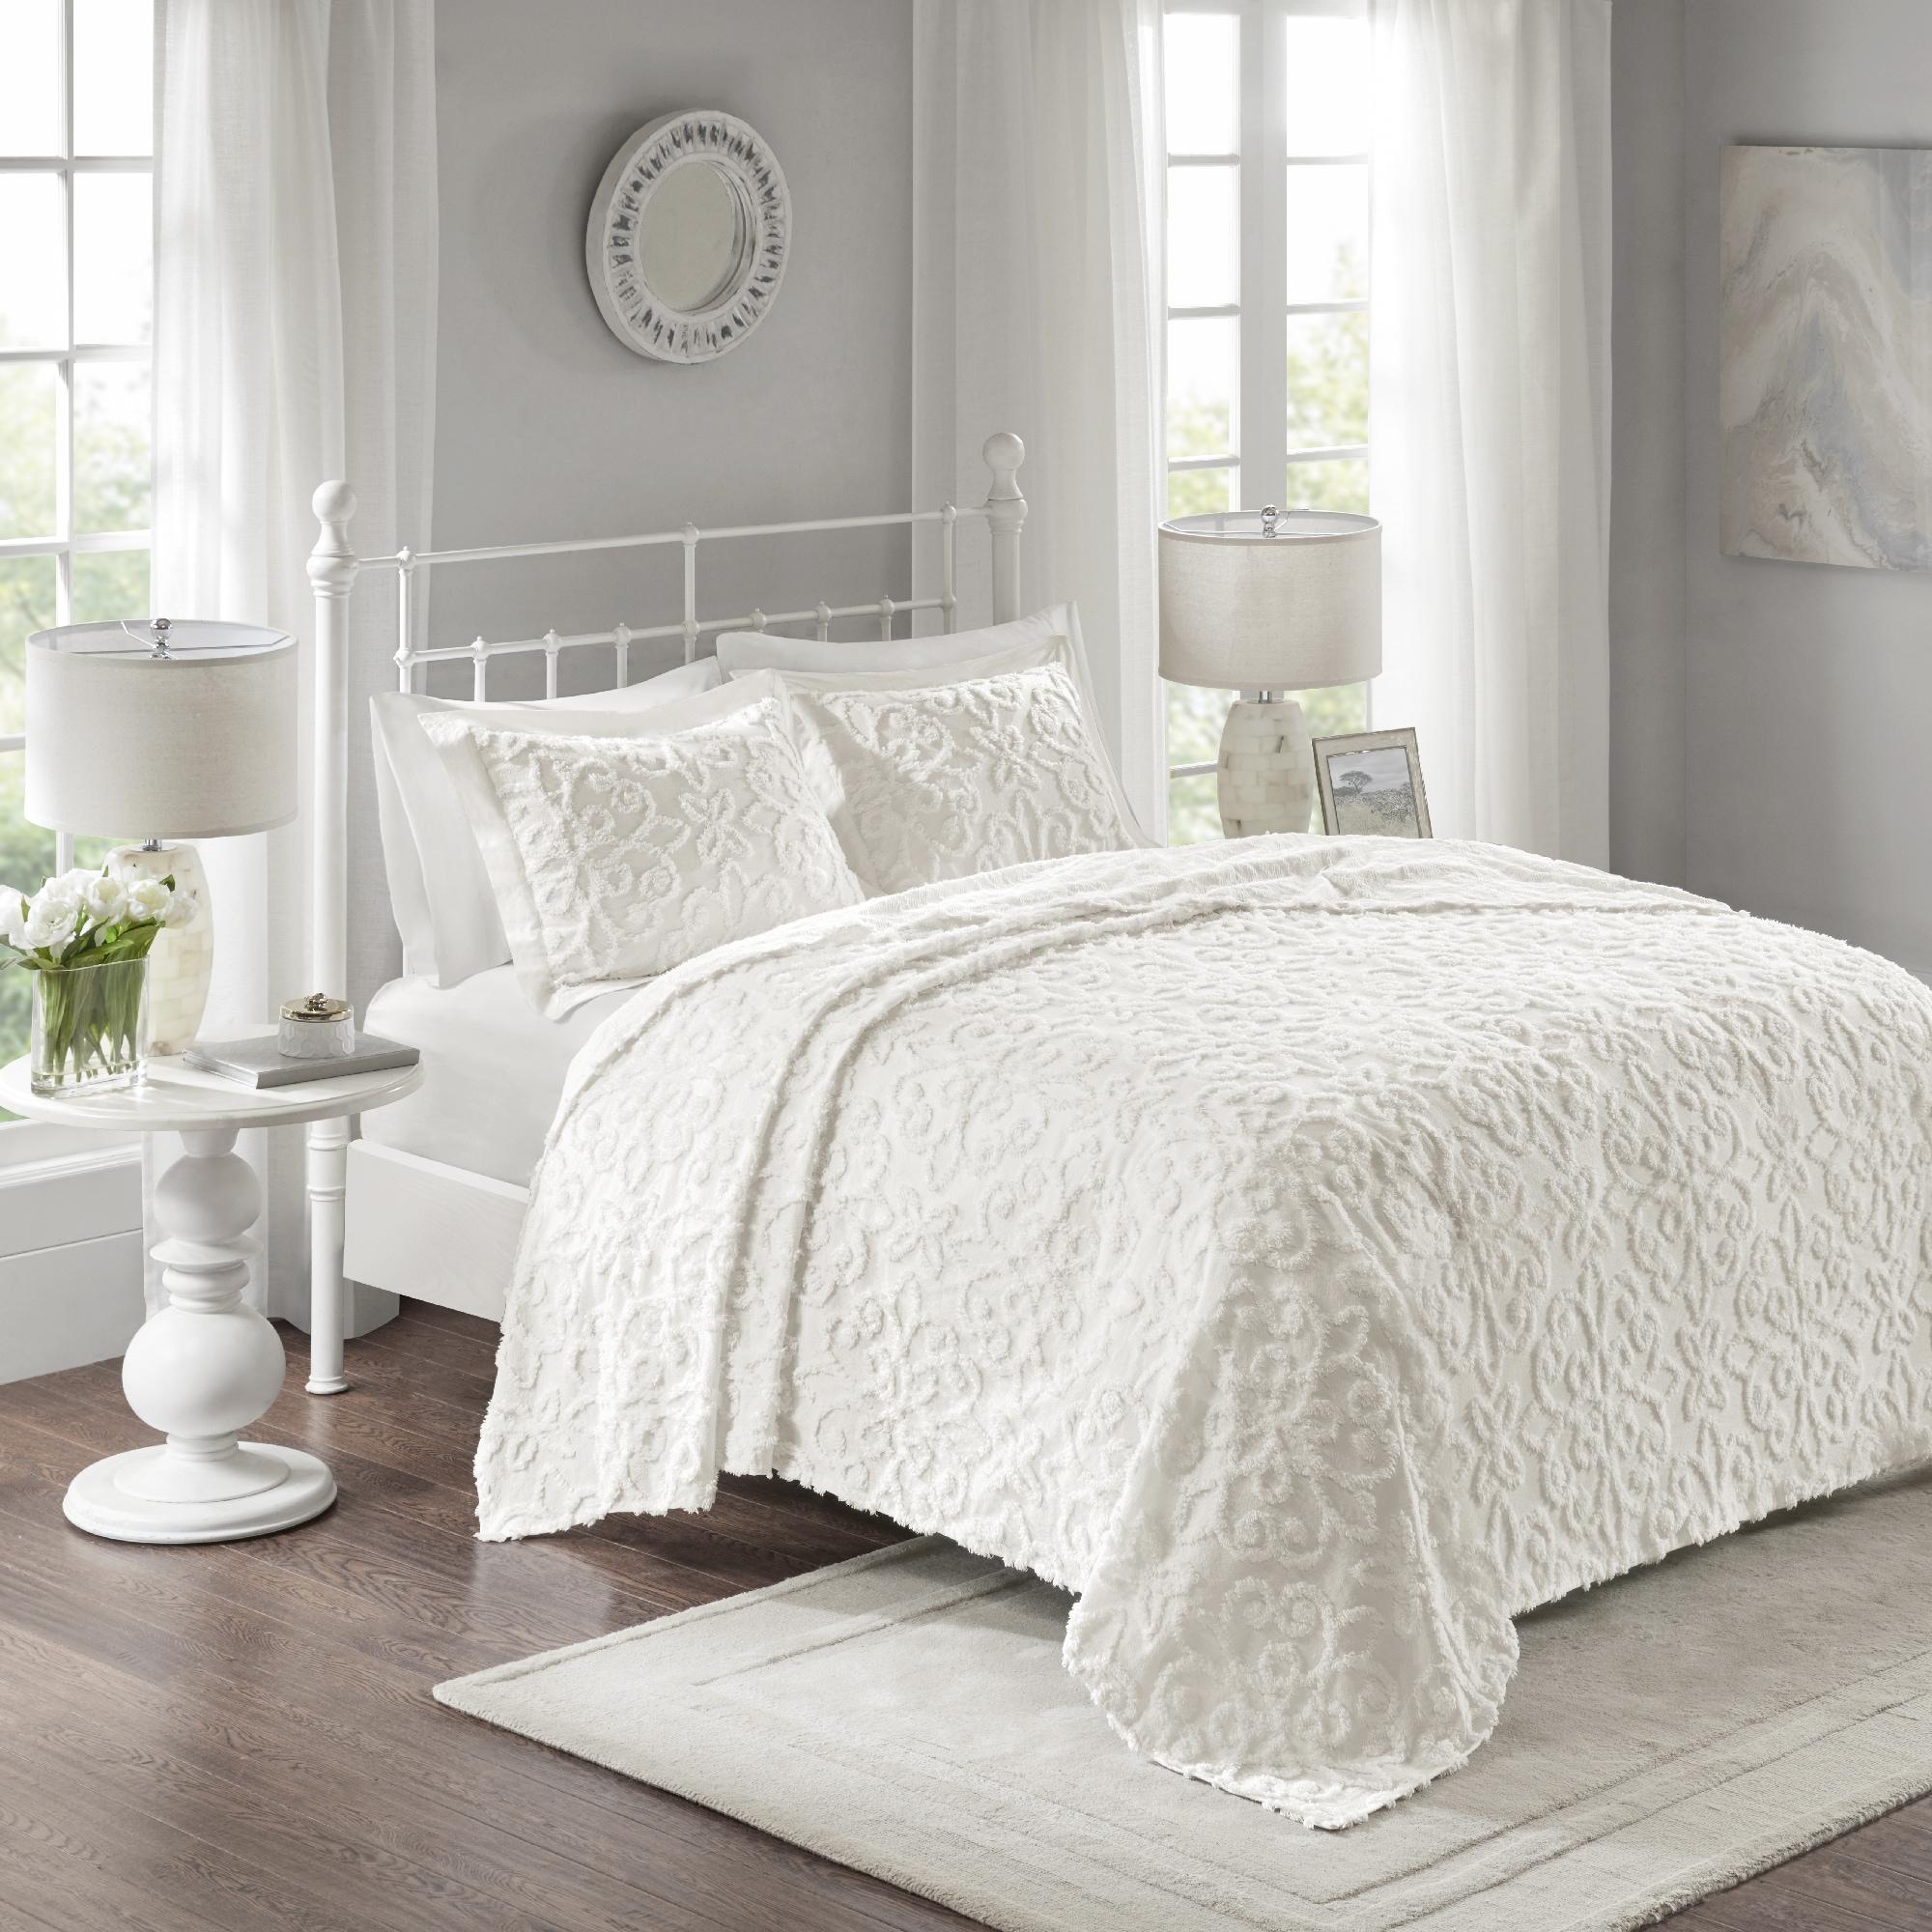 set com ip bedding quilt waverly overstock bed piece walmart moonlight medallion